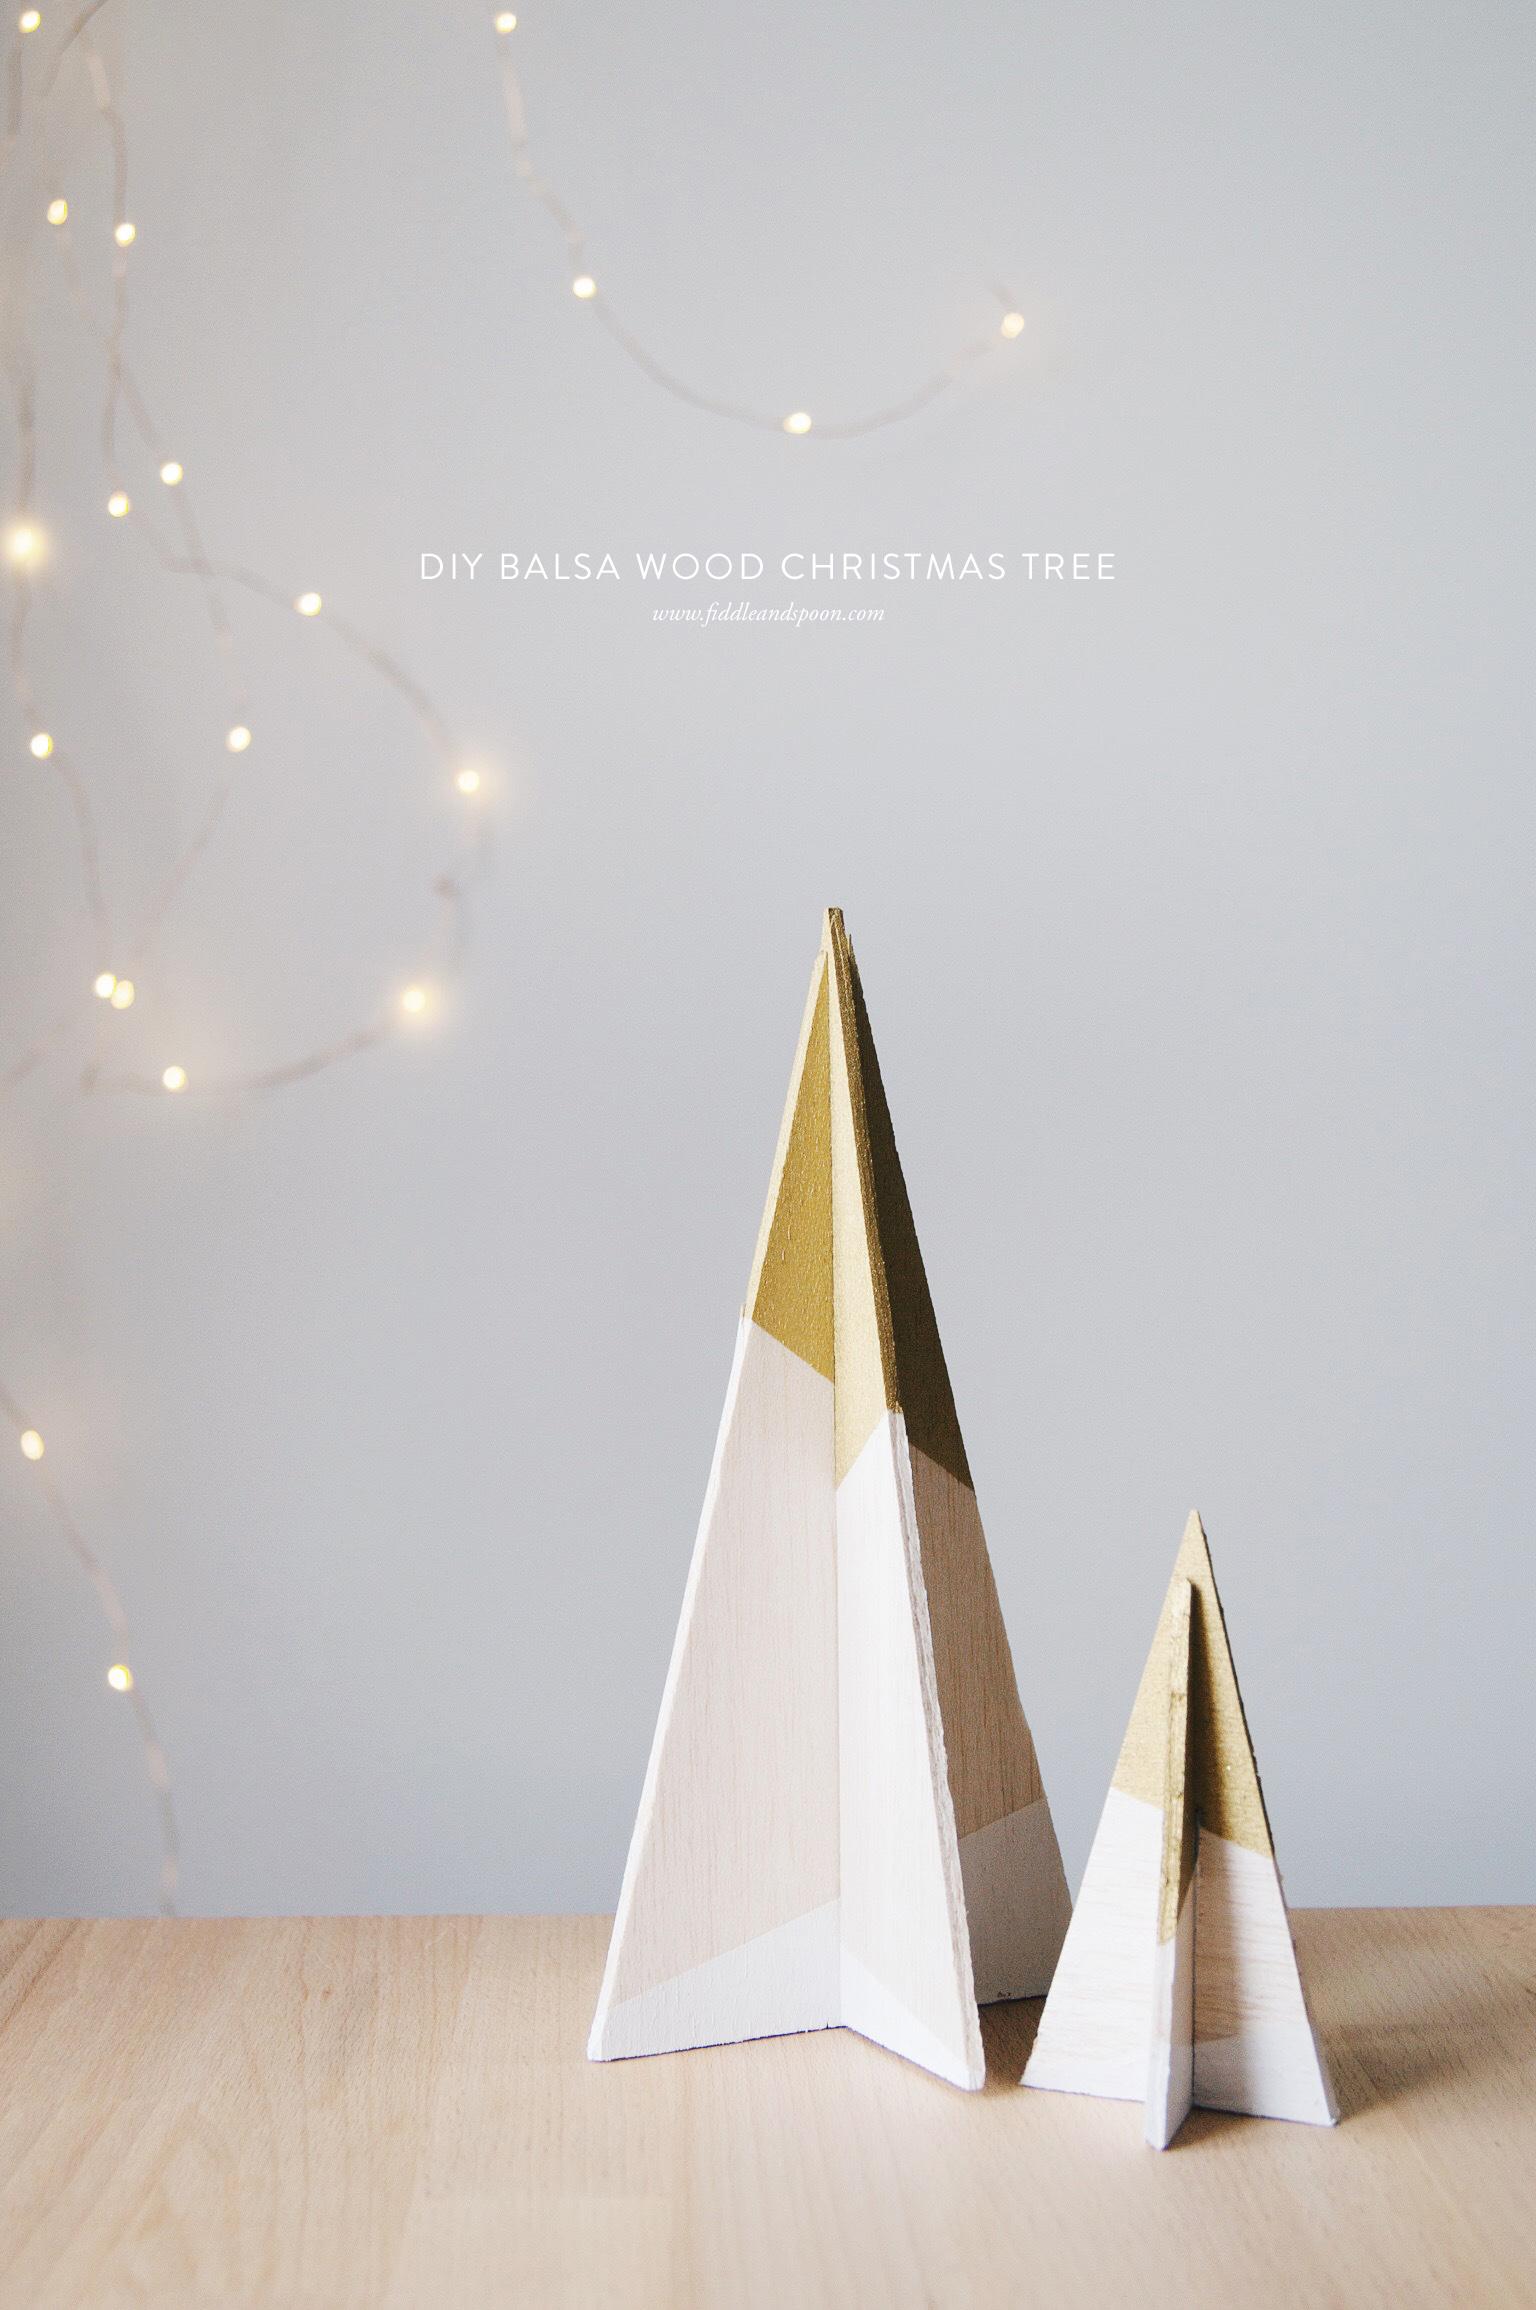 Balsa wood geometric Christmas tree DIY ornaments